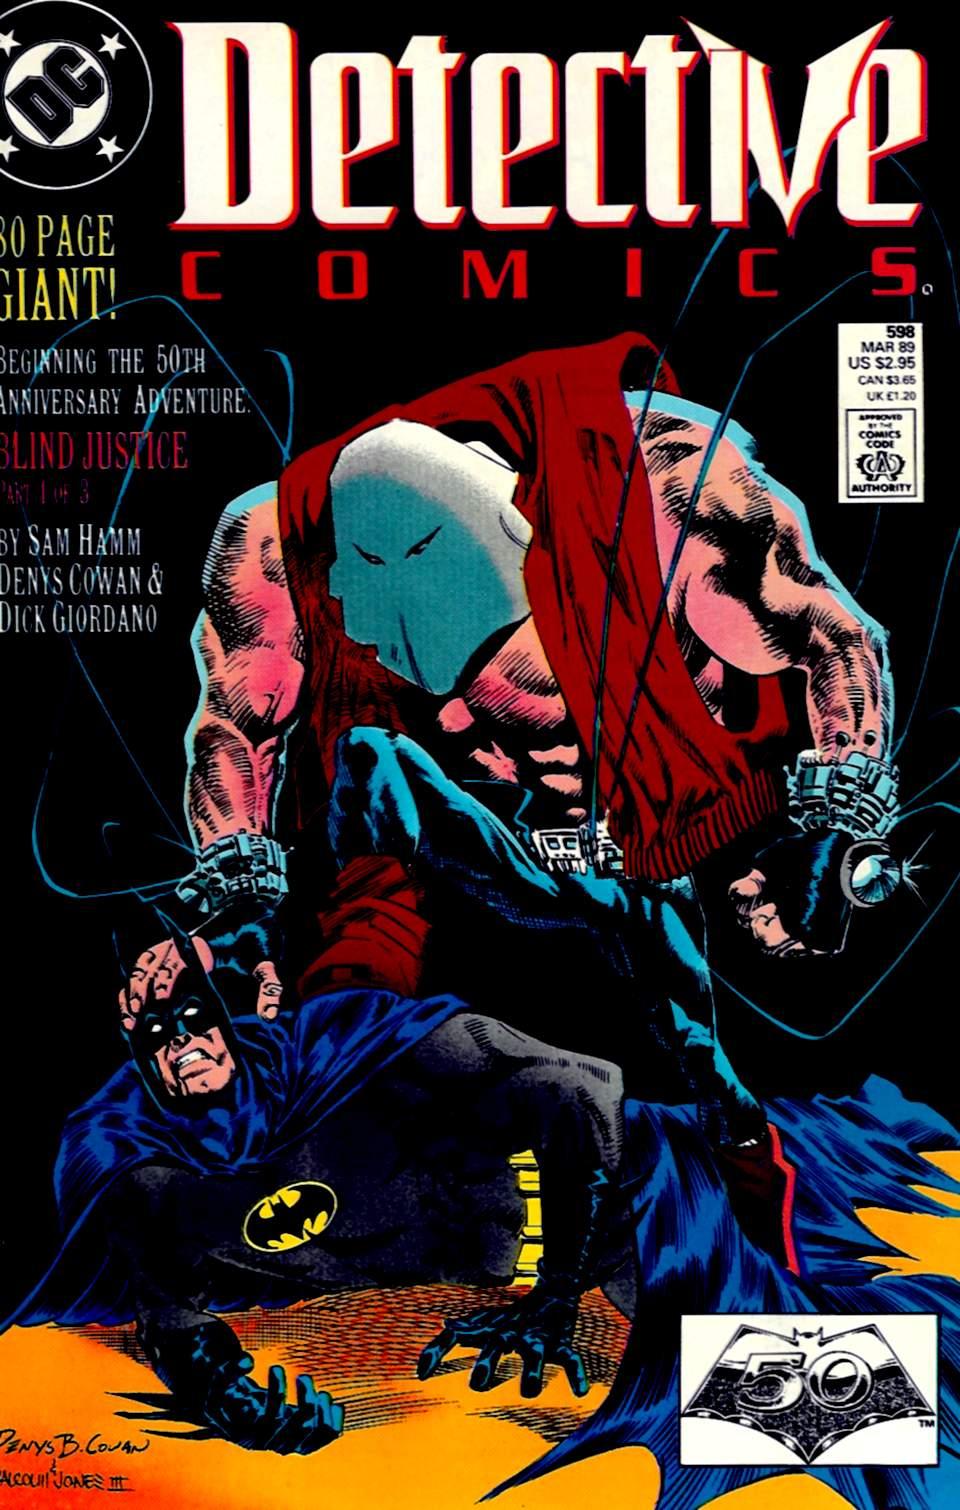 Detective Comics (1937) 598 Page 1